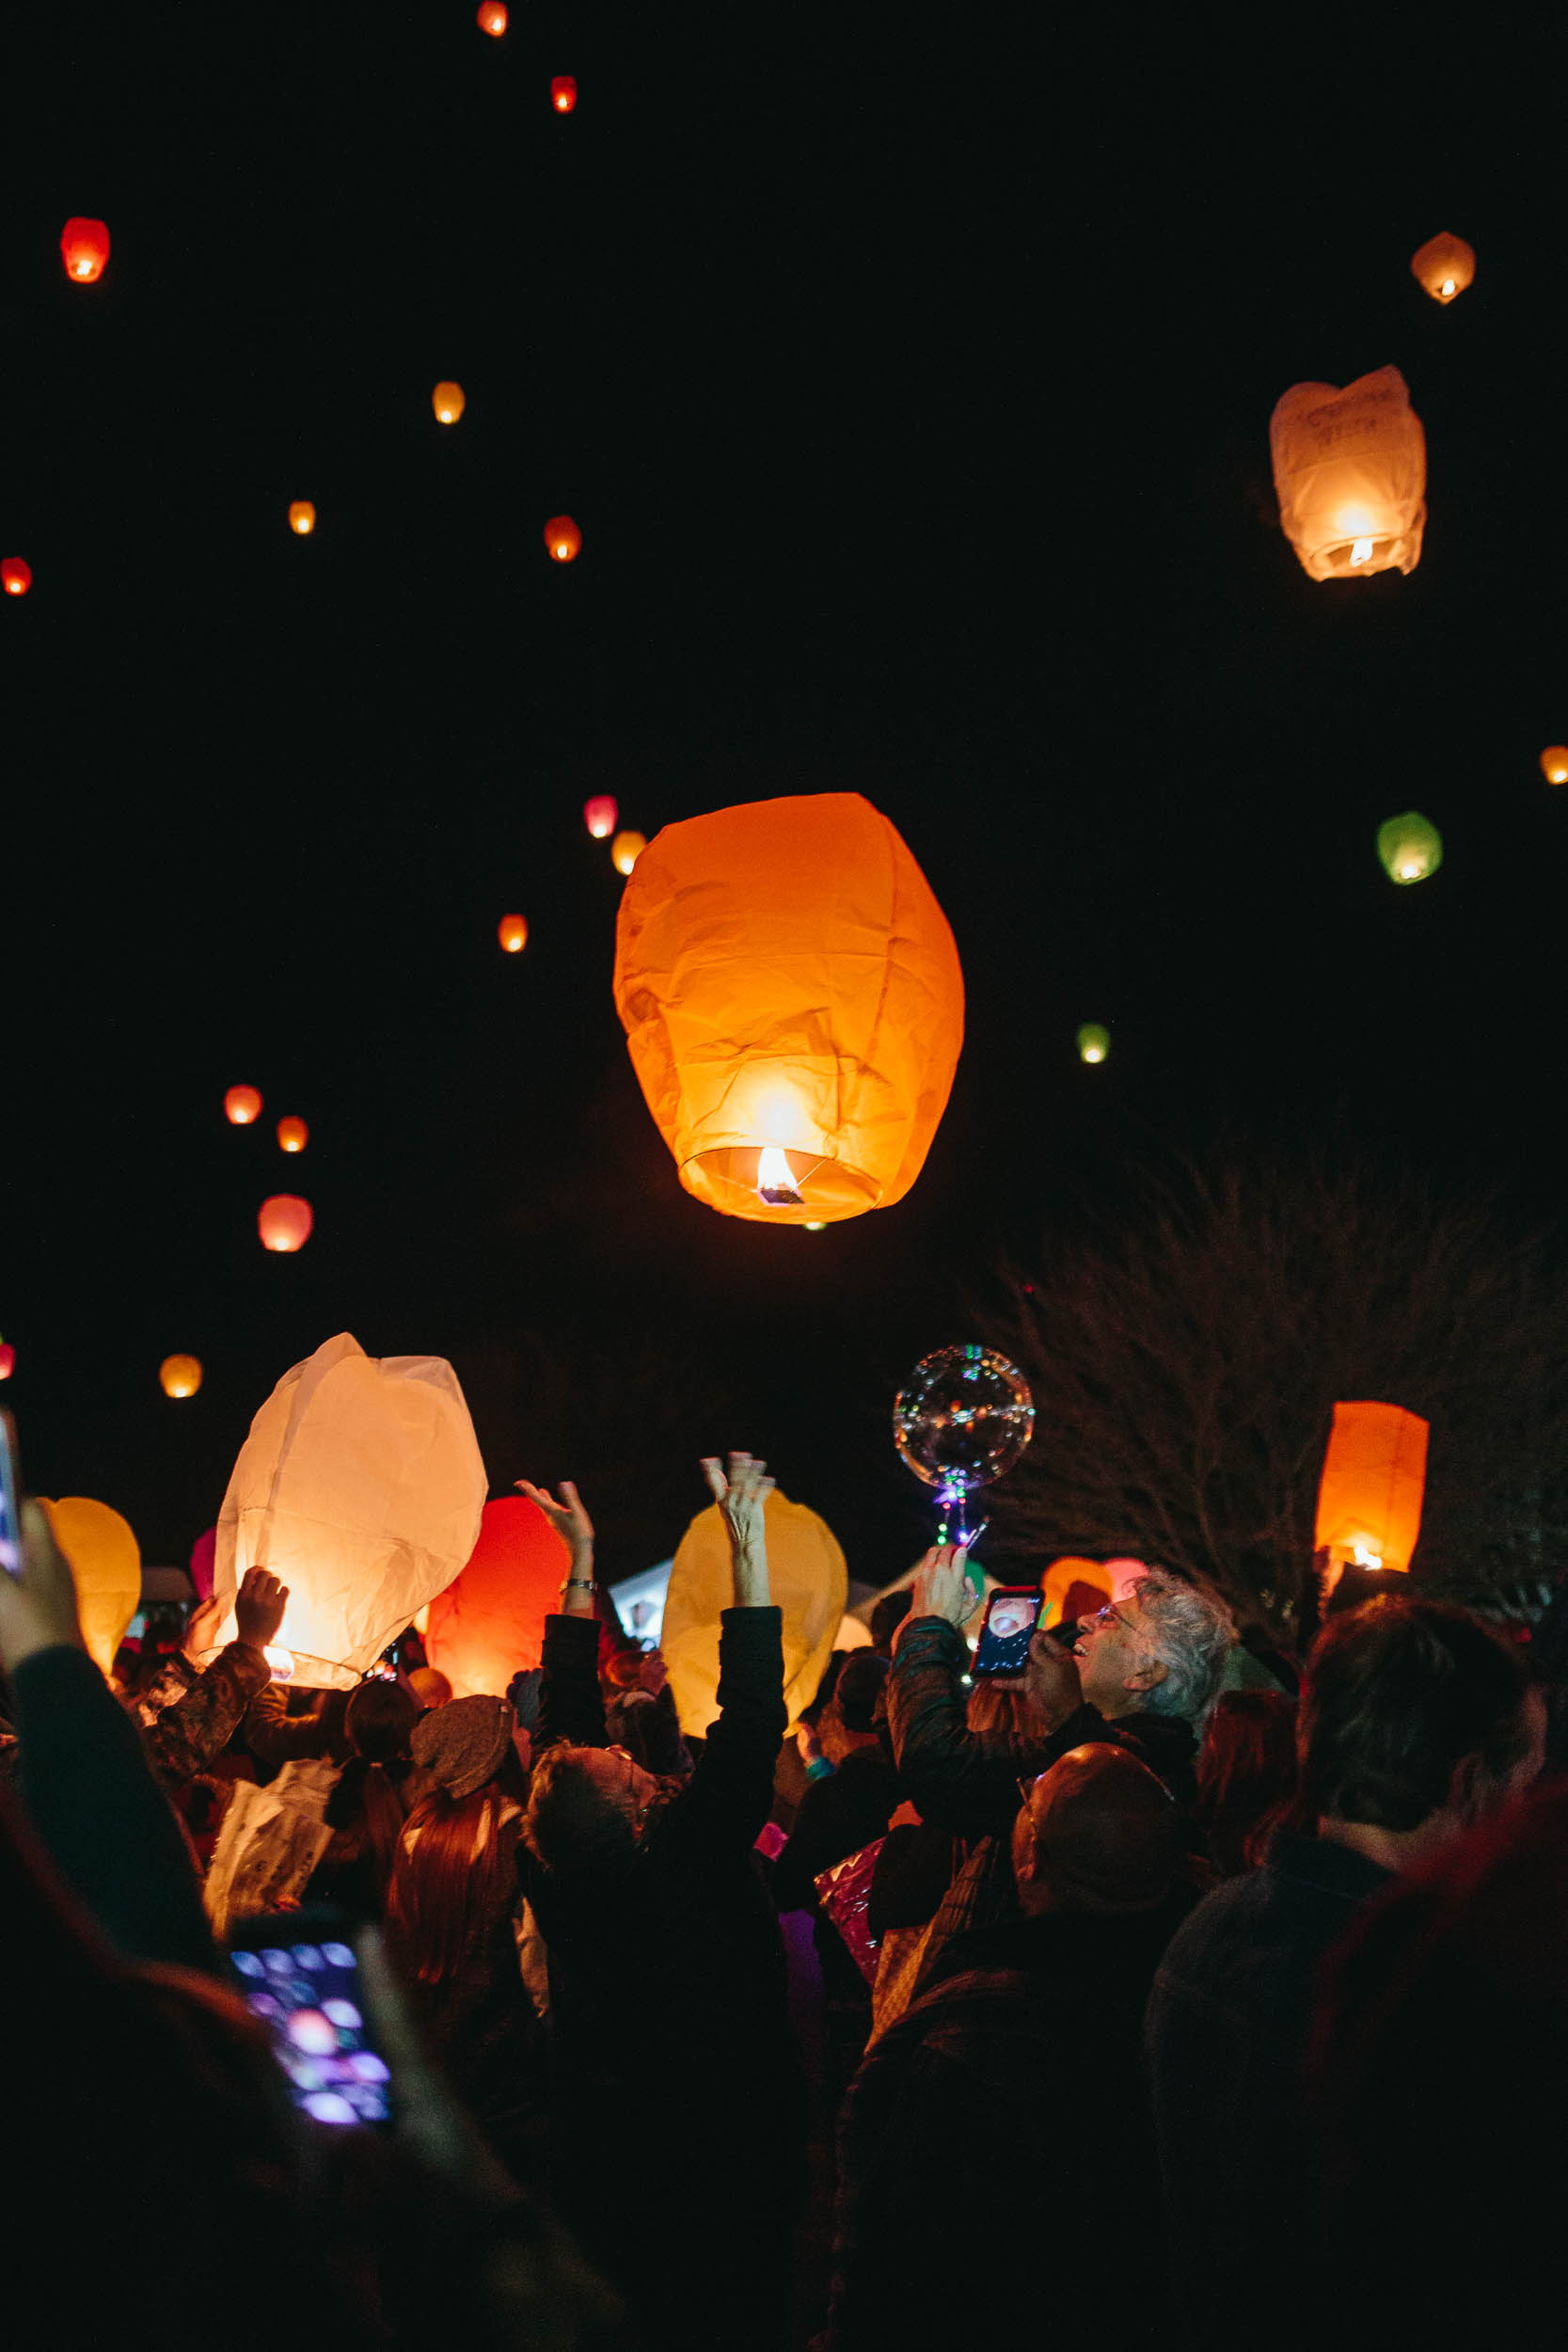 Kyle-Sheppard-Kanab-Balloon-Festival-57.jpg